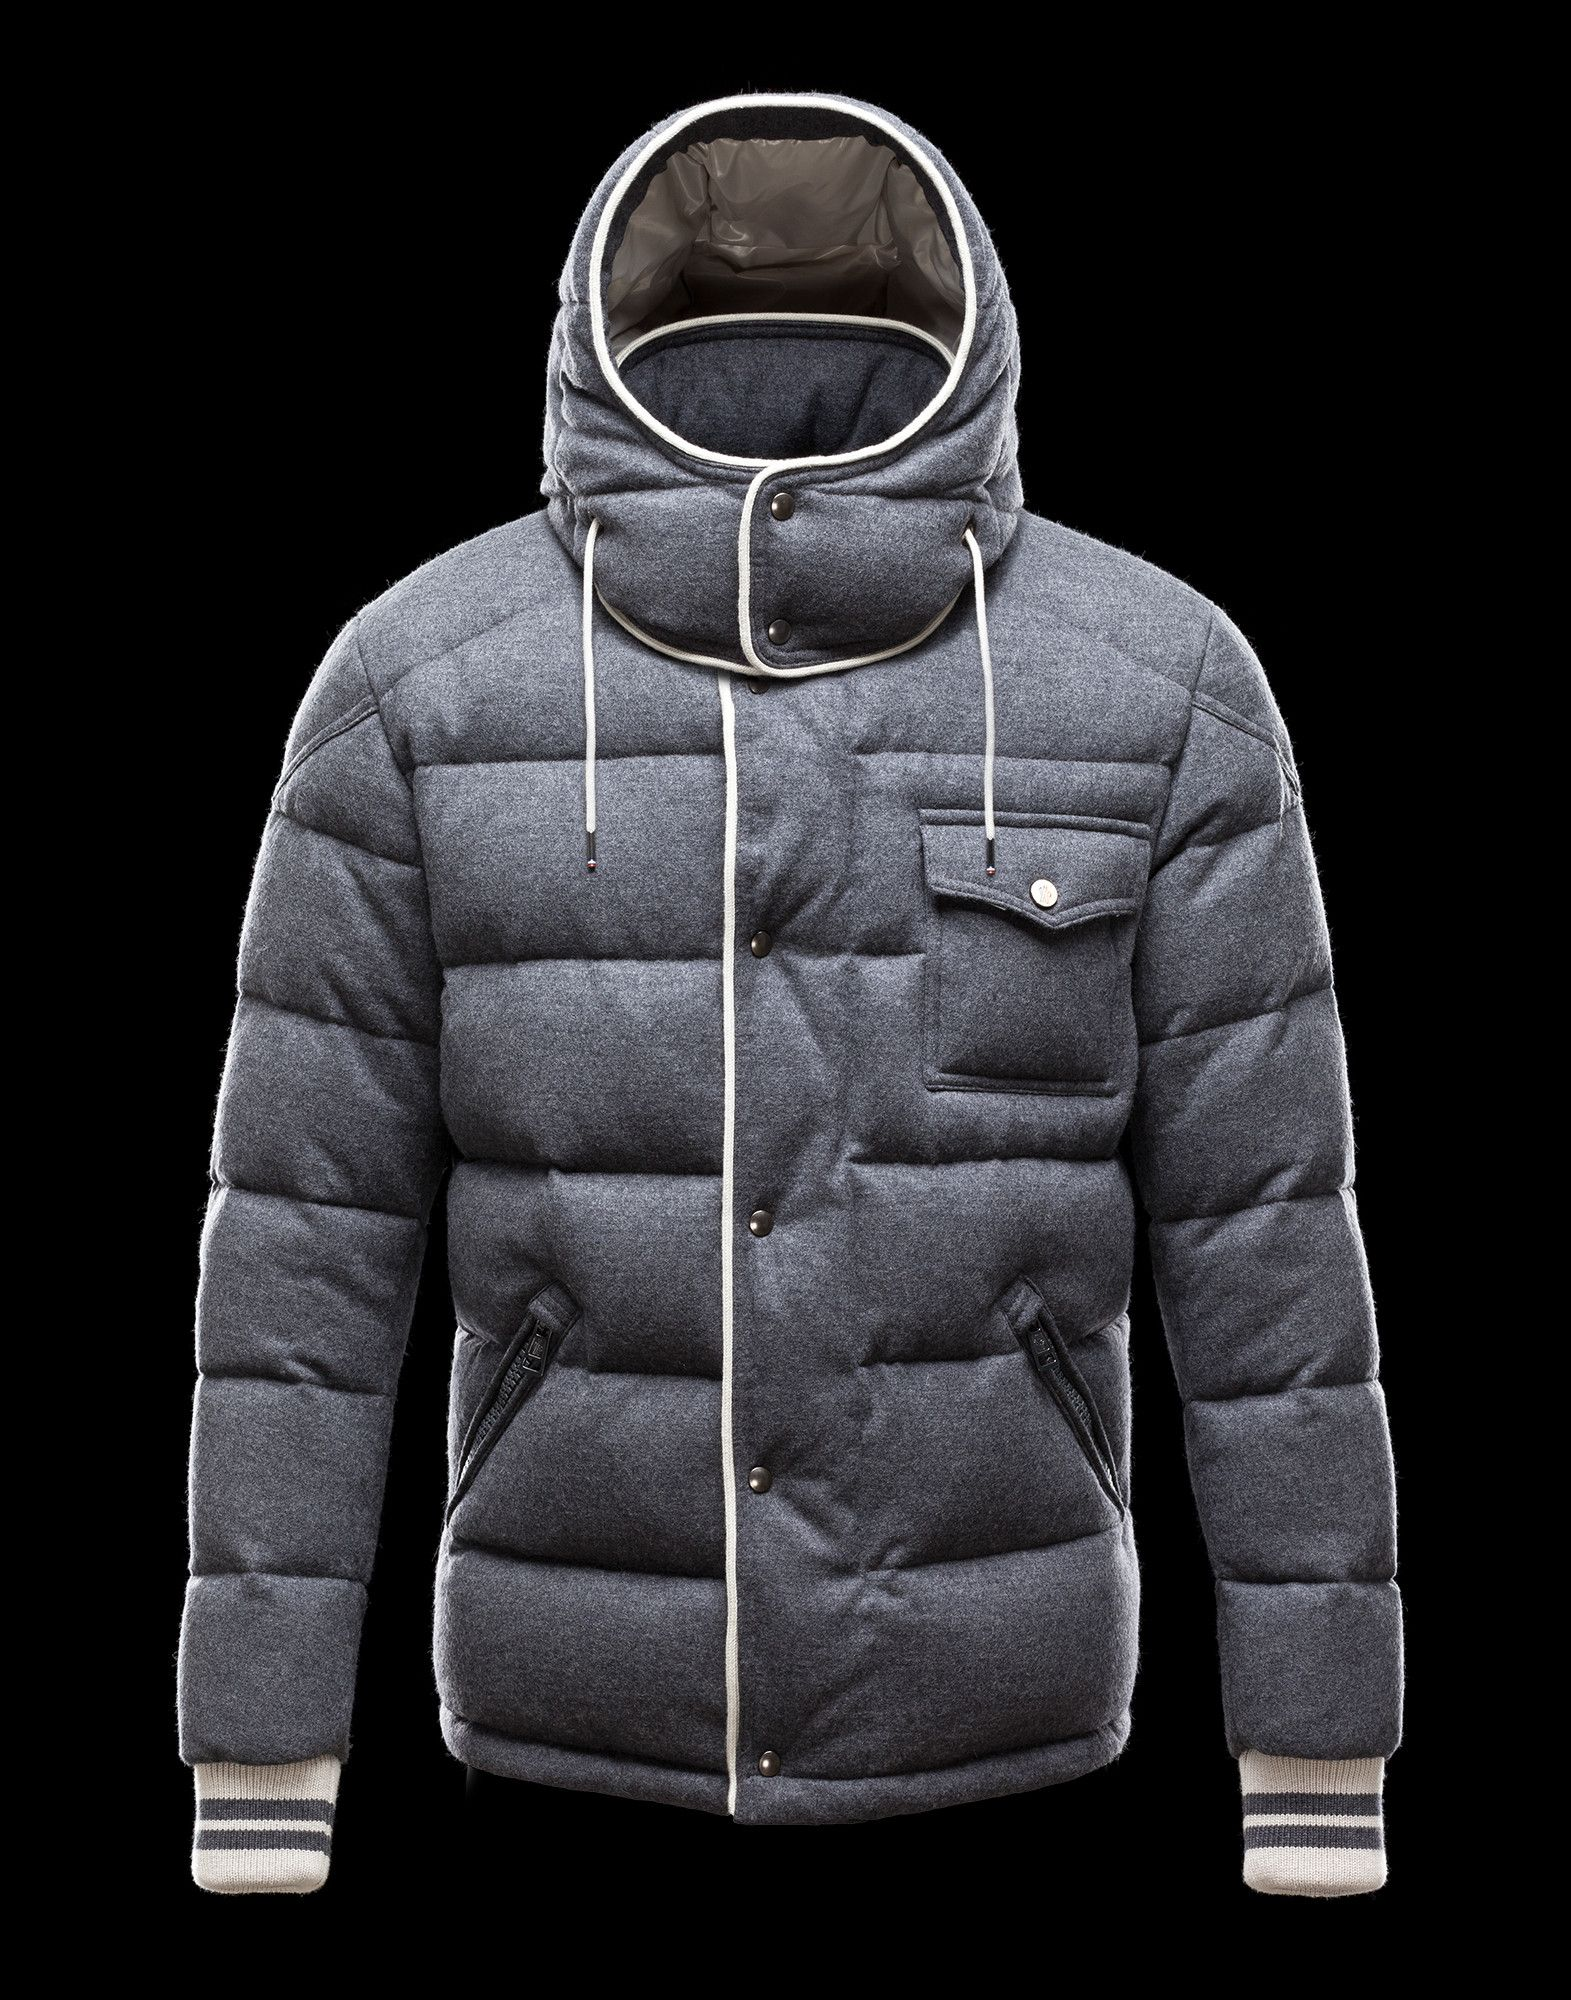 moncler@#$99 on in 2019 | 男装 | Moncler jacket mens